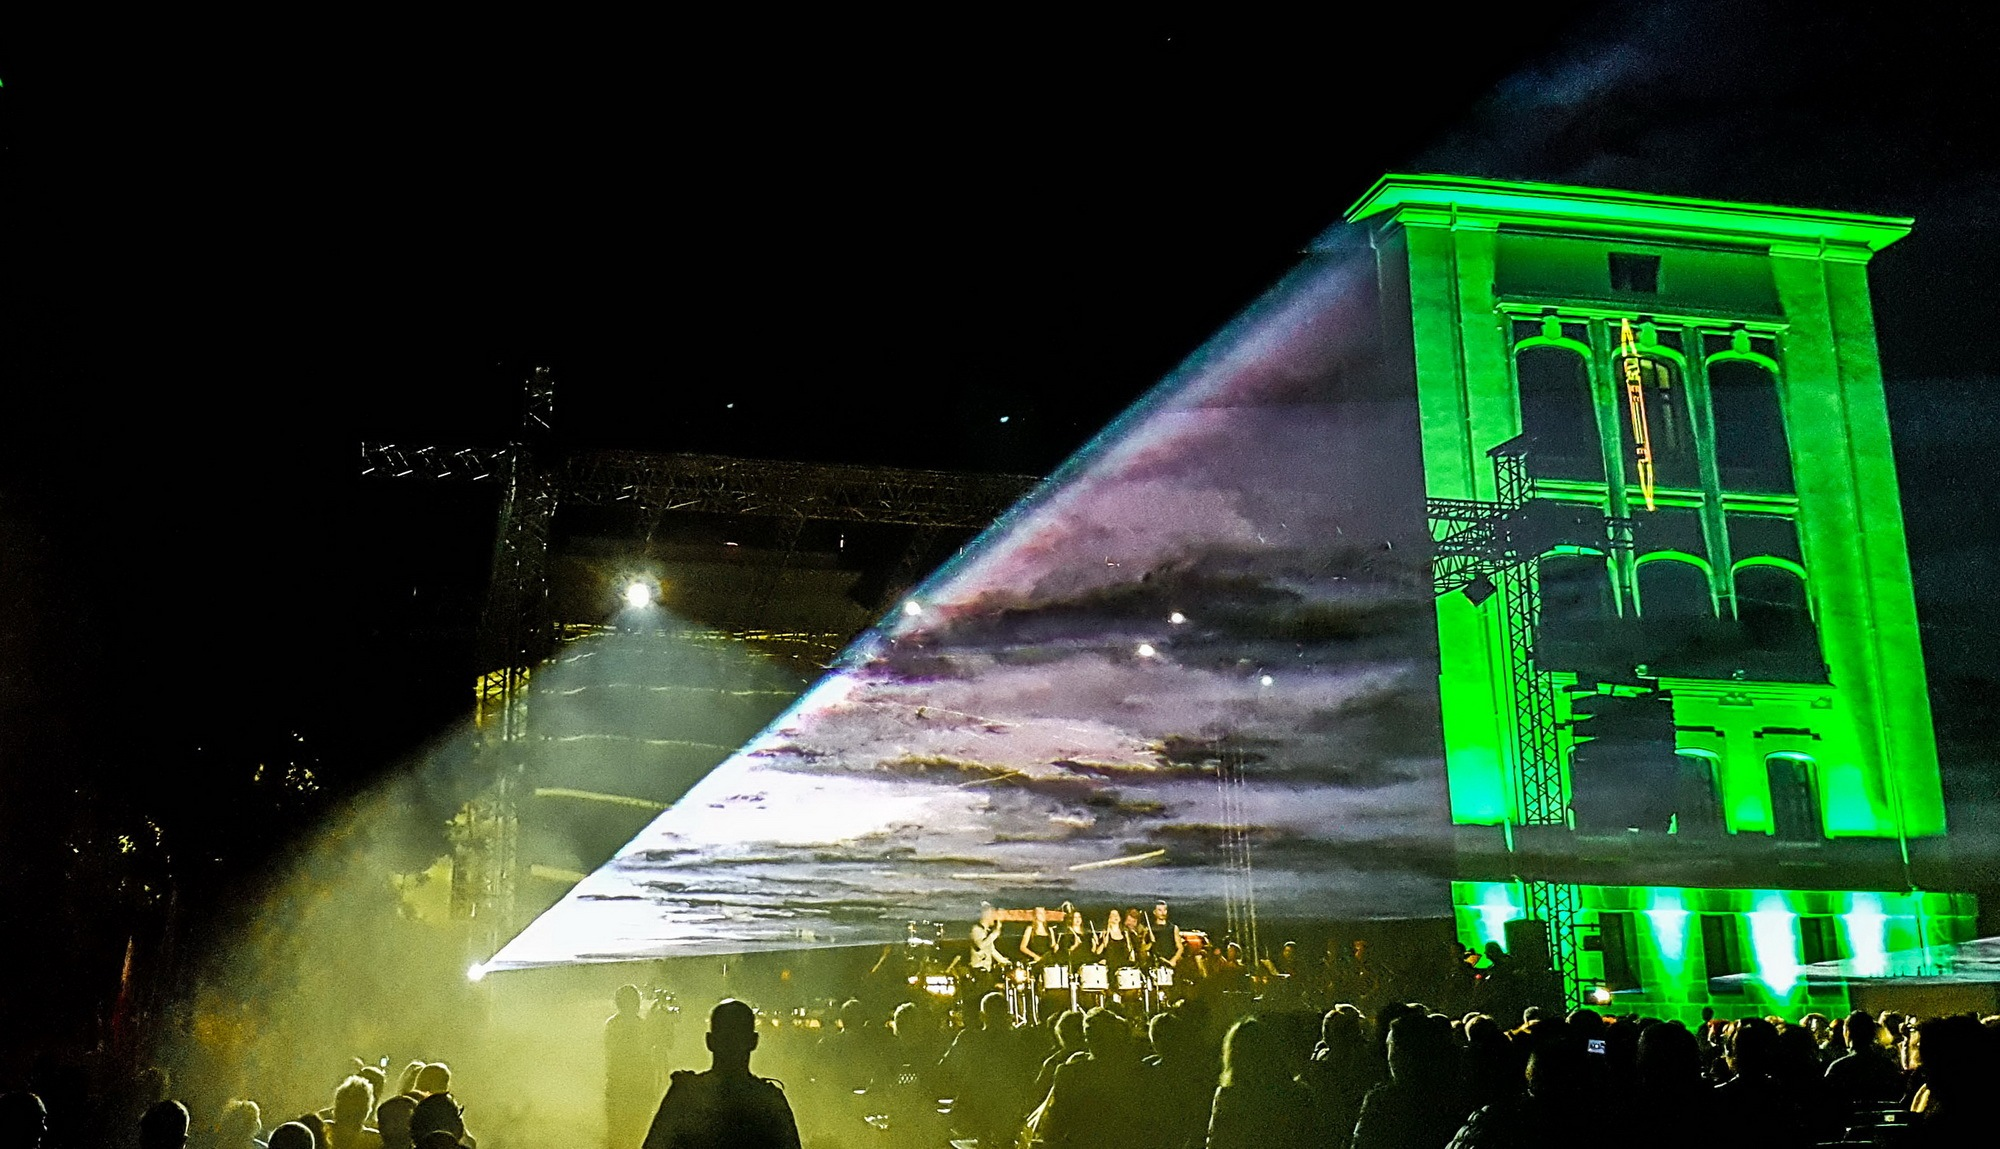 Laser and The Man by EnacheArmandIustinian